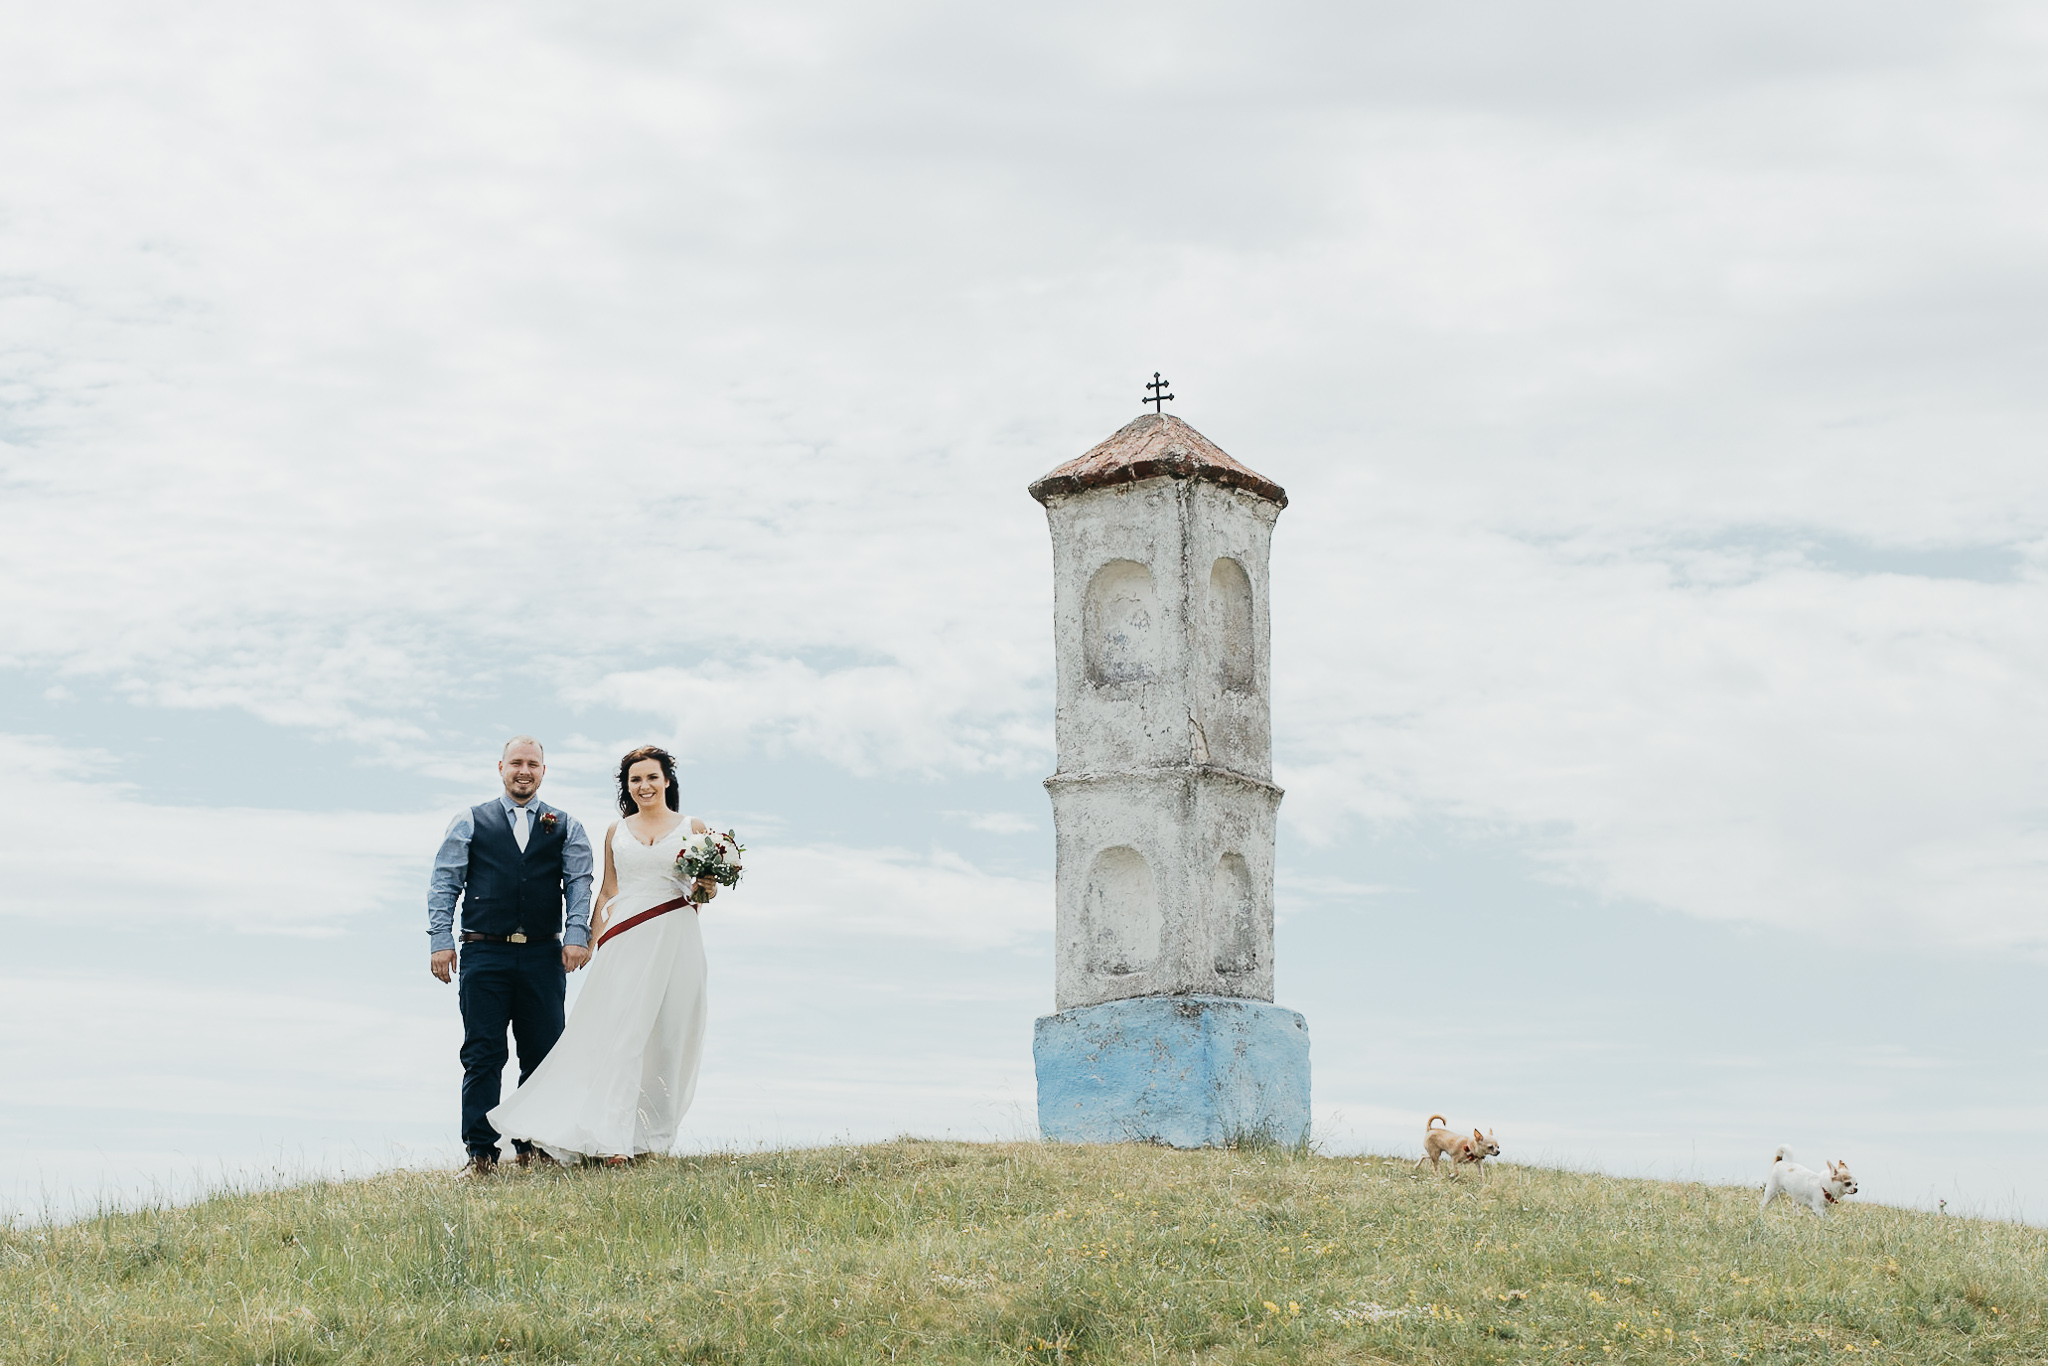 kubousfoto_svatebni_fotograf_brno_wedding_MG_4421